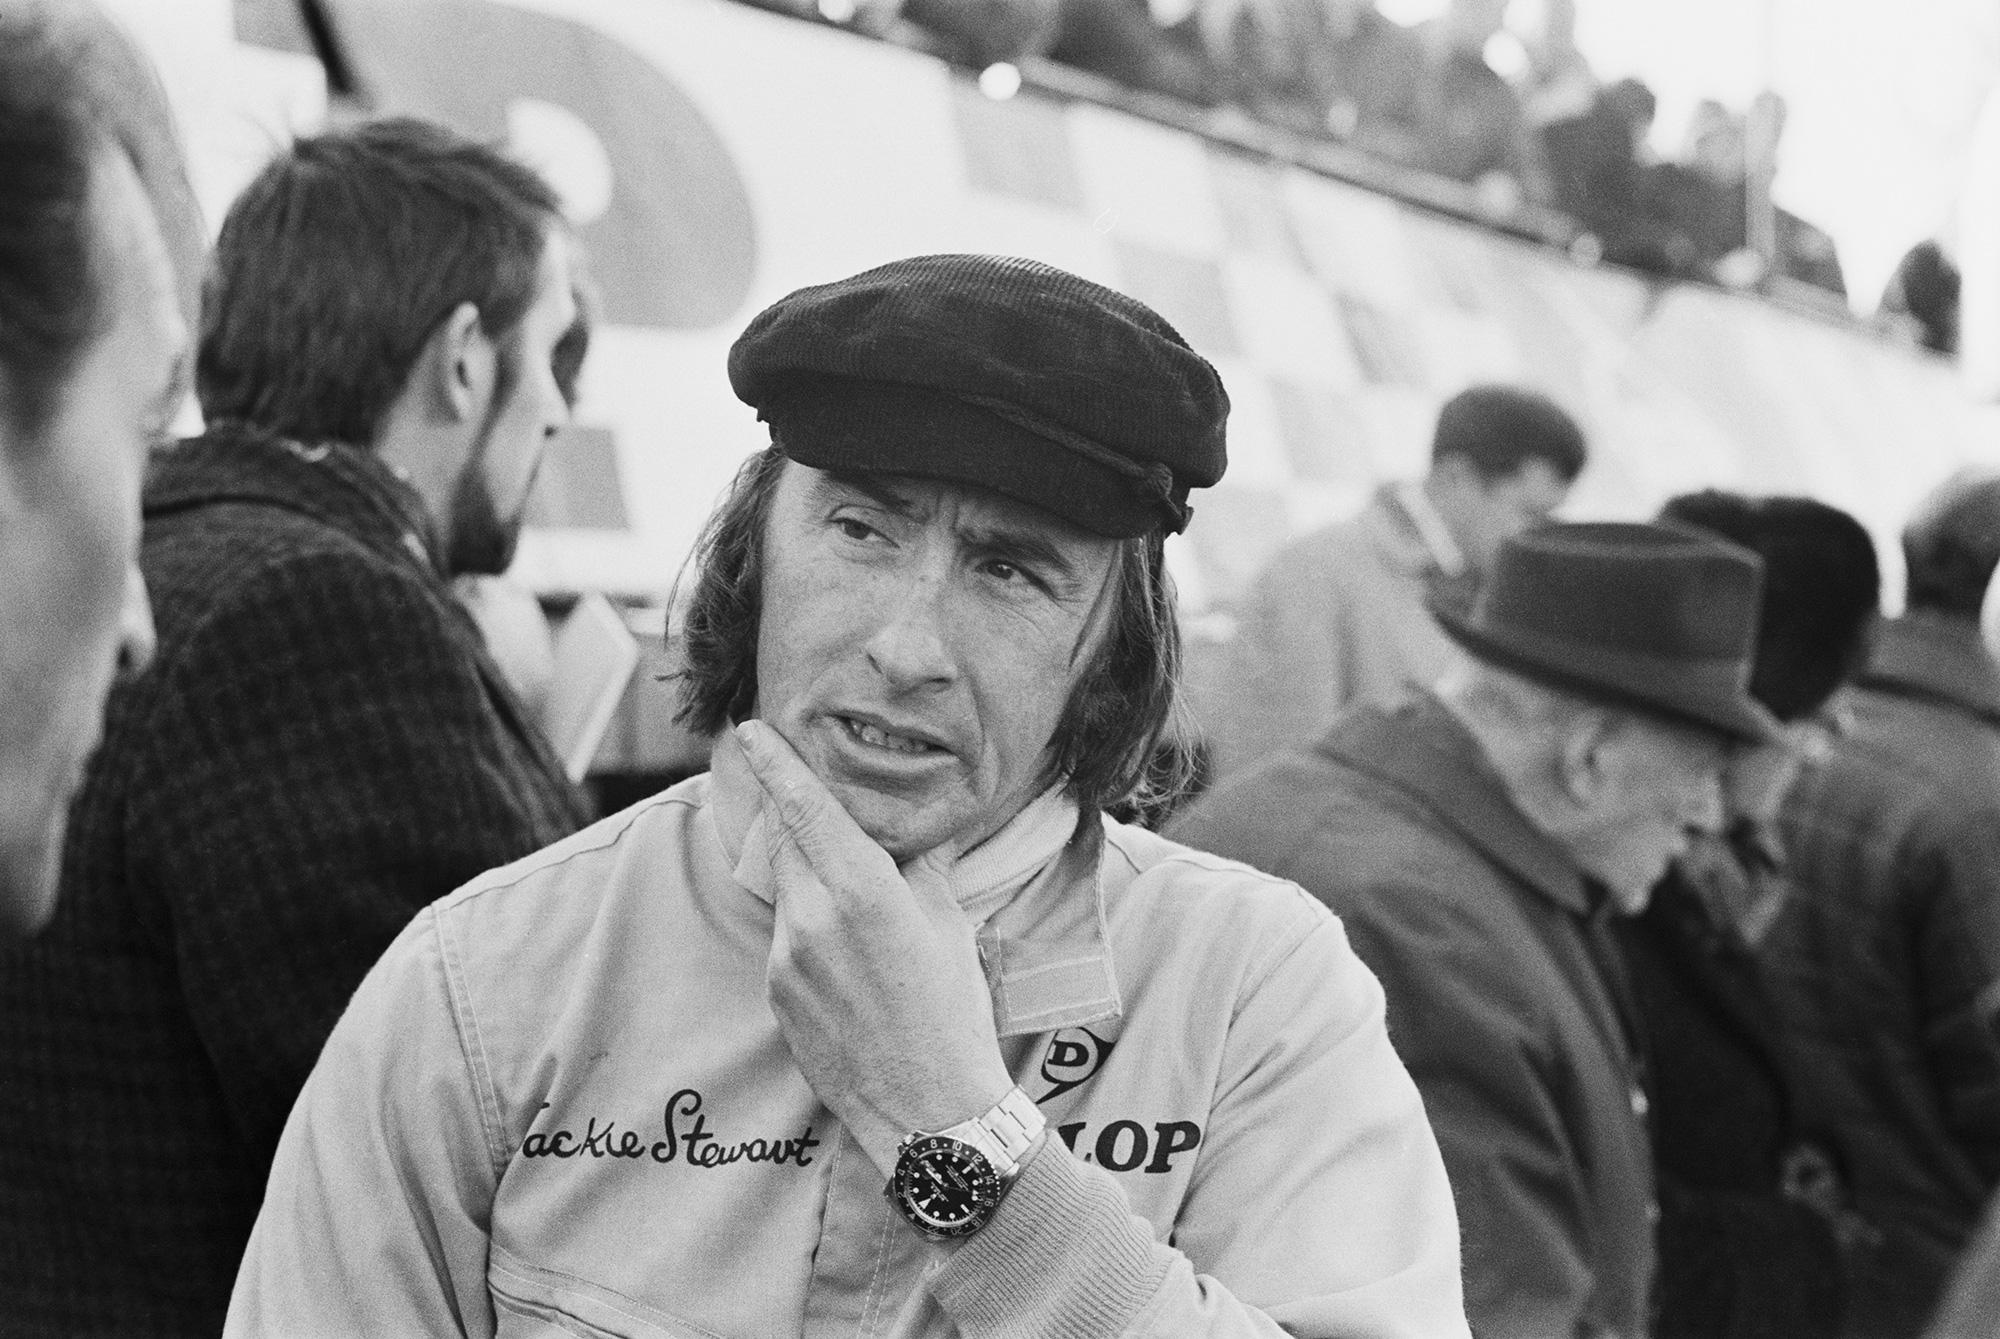 Racing legend Sir Jackie Stewart in the UK, 6 March 1970